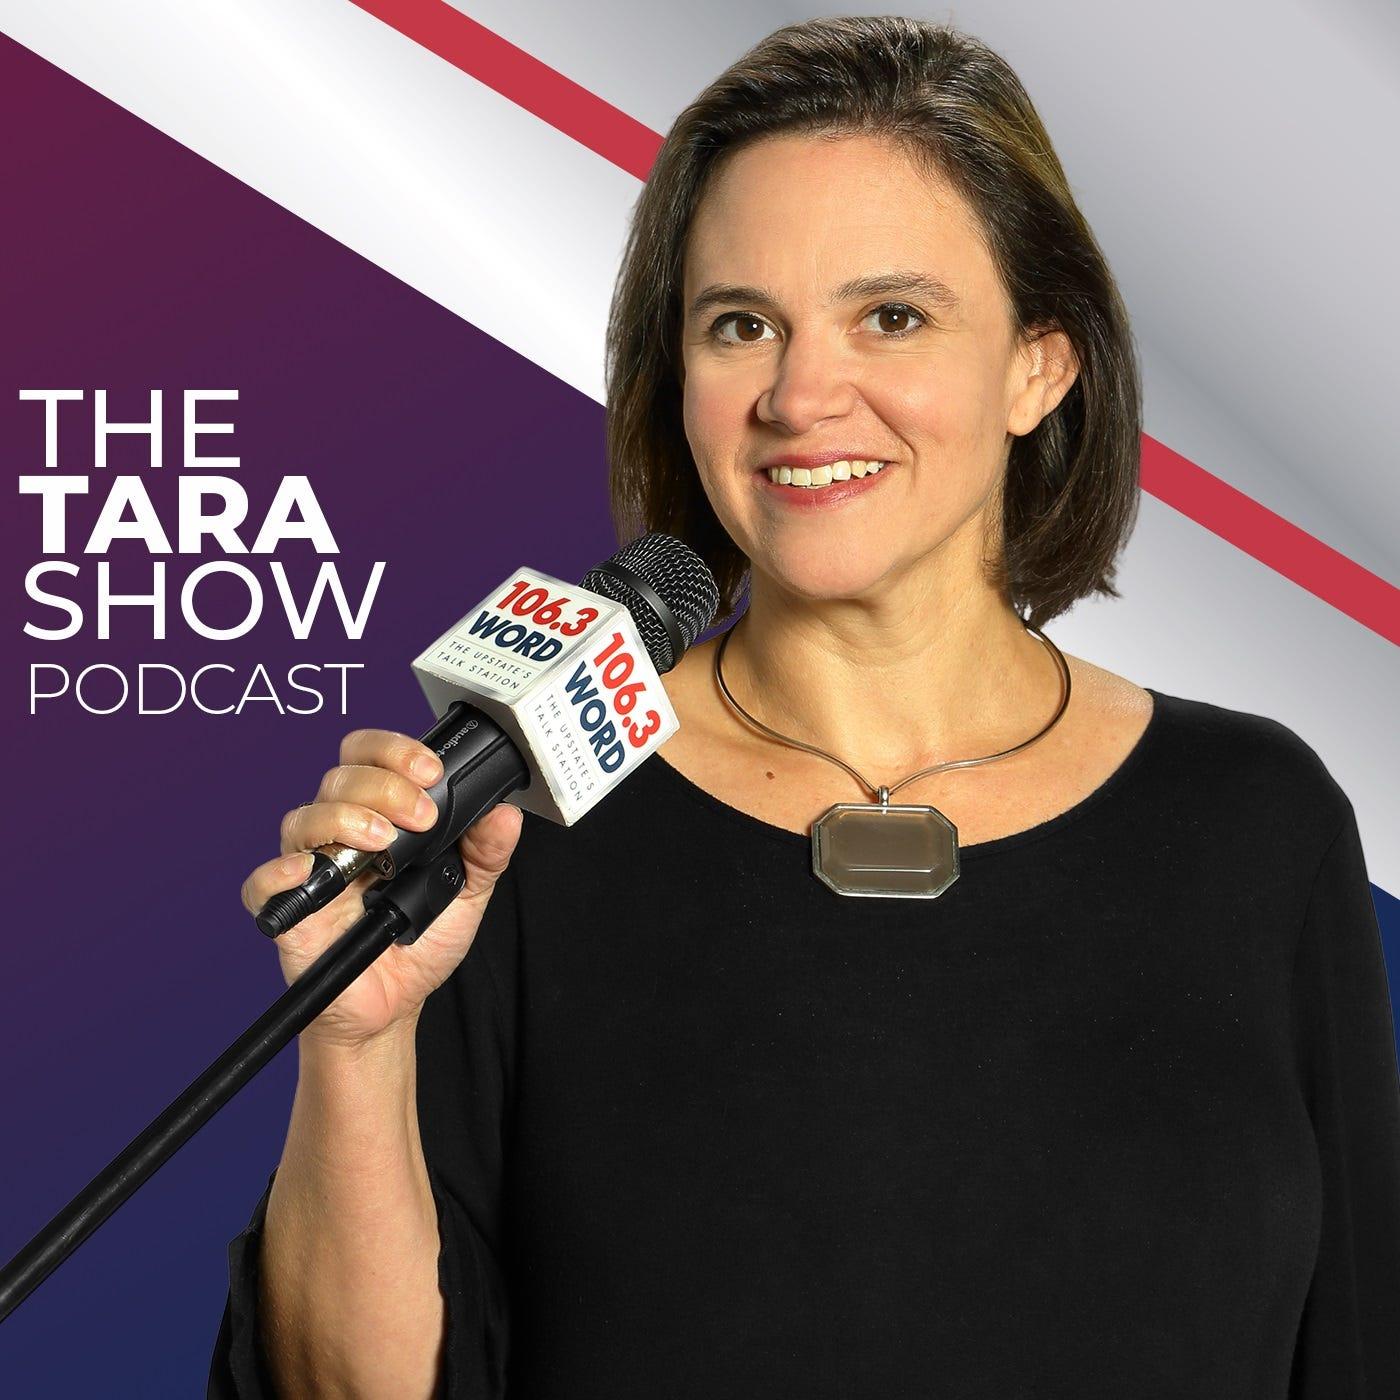 The Tara Show